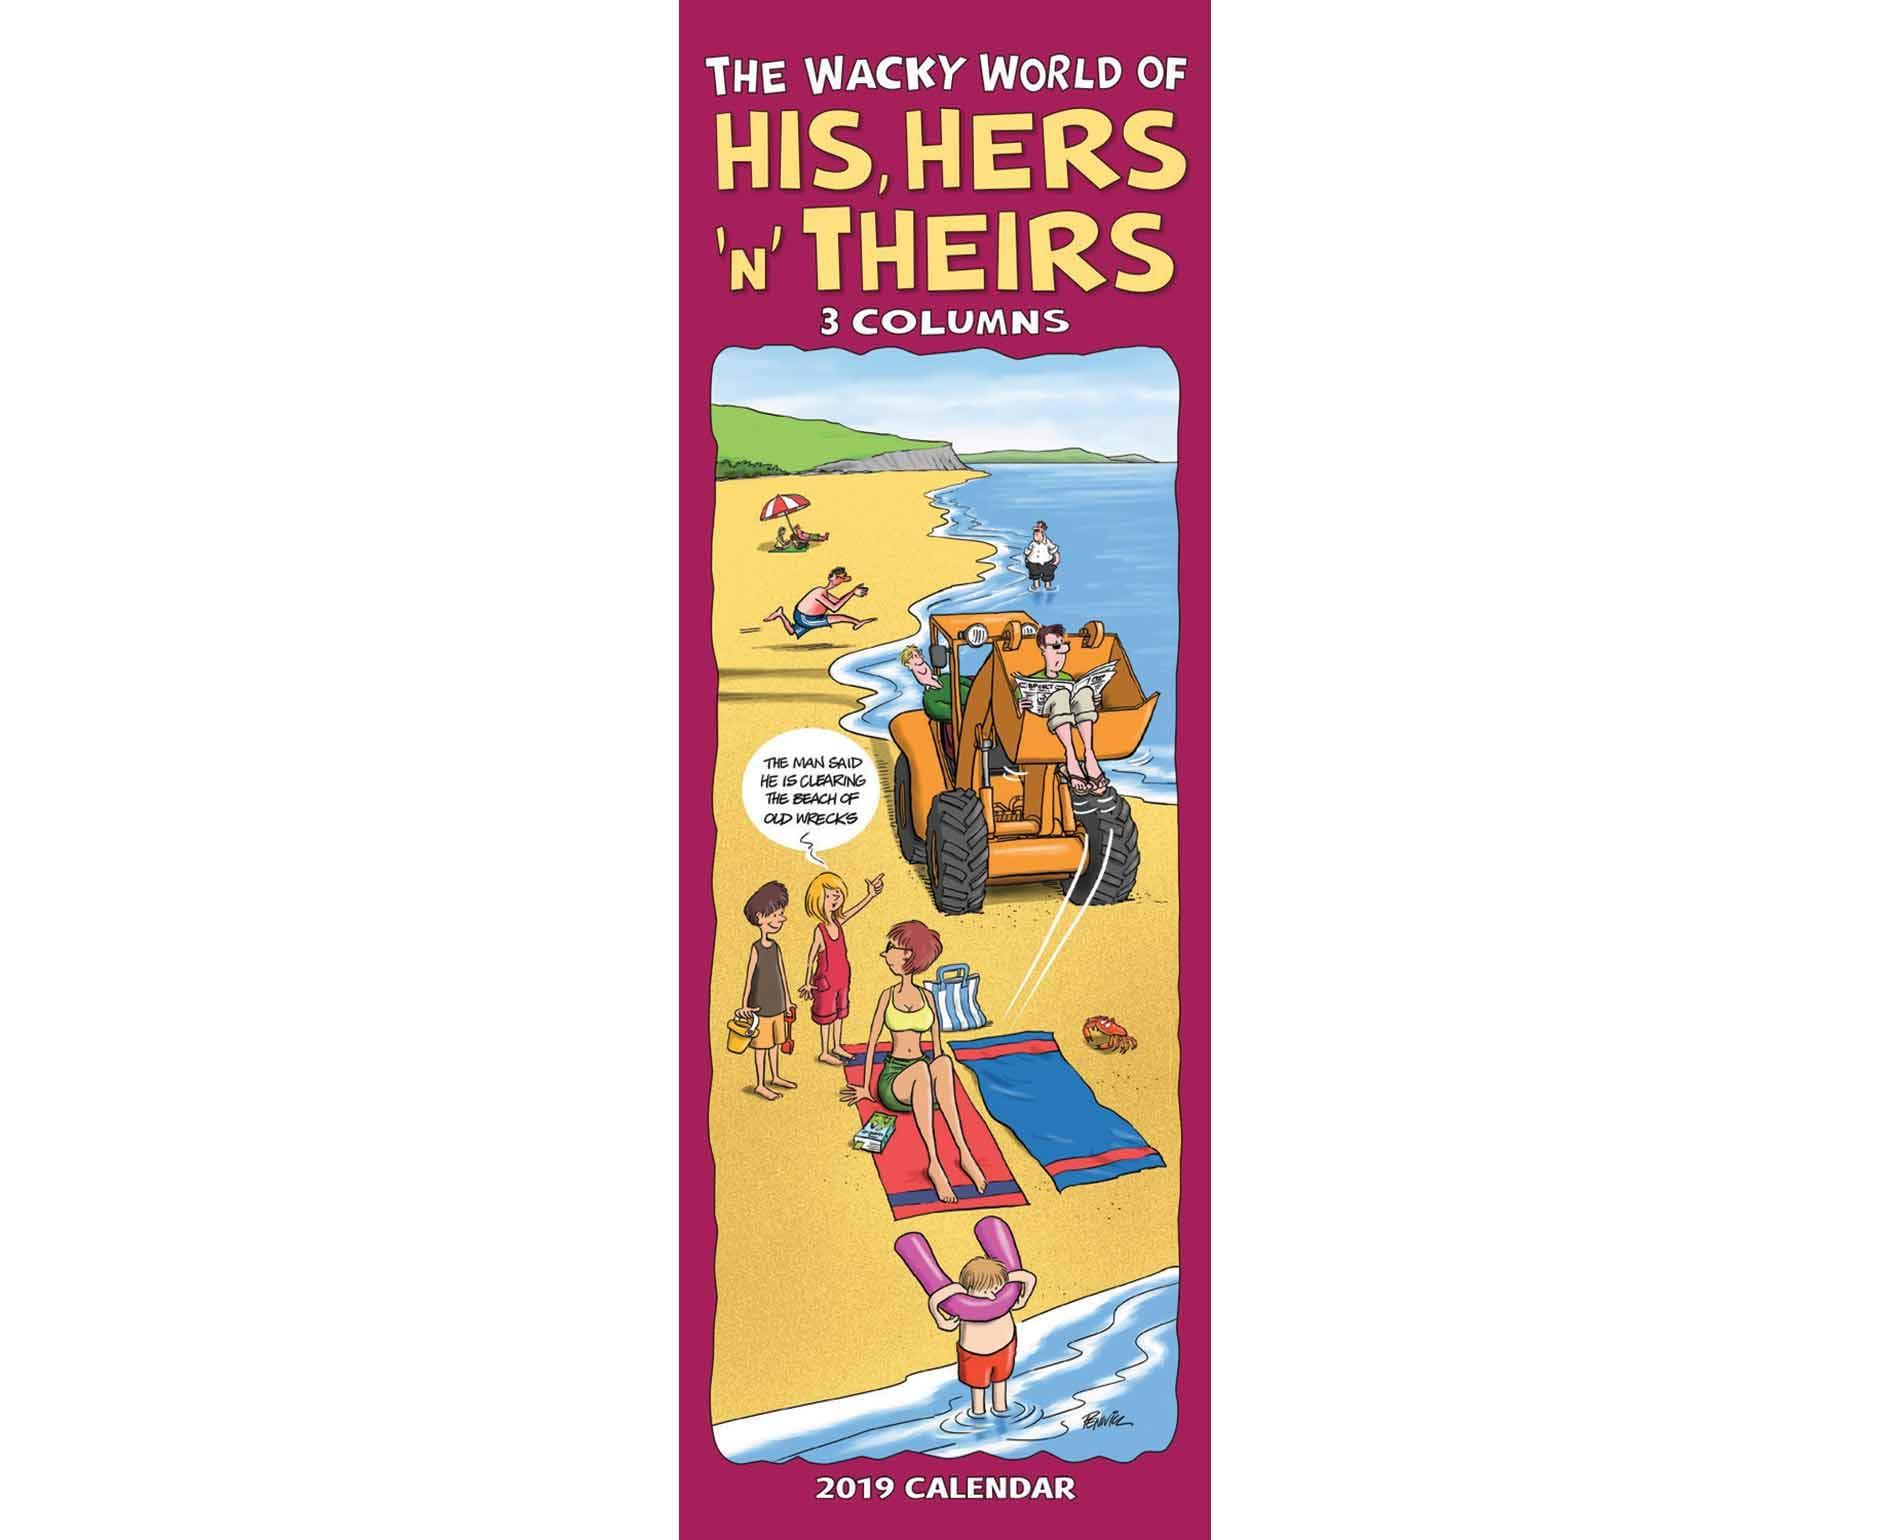 Wacky World of His Hers & Theirs P S 201 (Slim Planner) Paperback – 13 Aug 2018 Carousel Calendars 2019 1786671220 Schreibwaren (bedruckt)